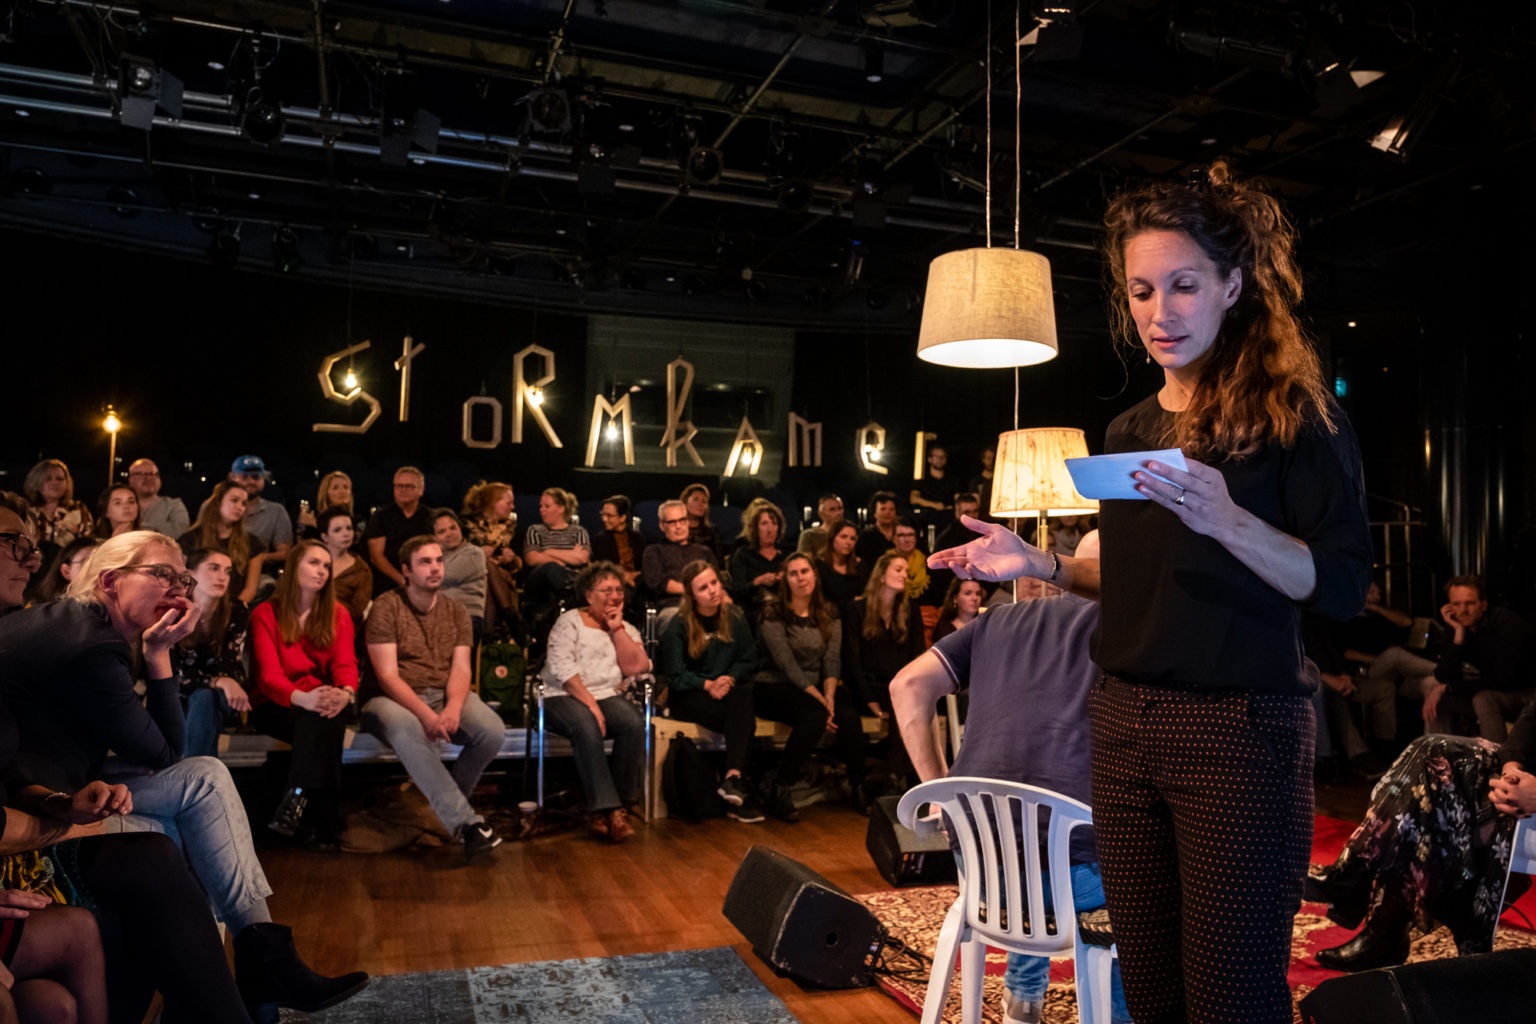 Stormkamer_TheatersTilburg_lores_WilliamvanderVoort-040